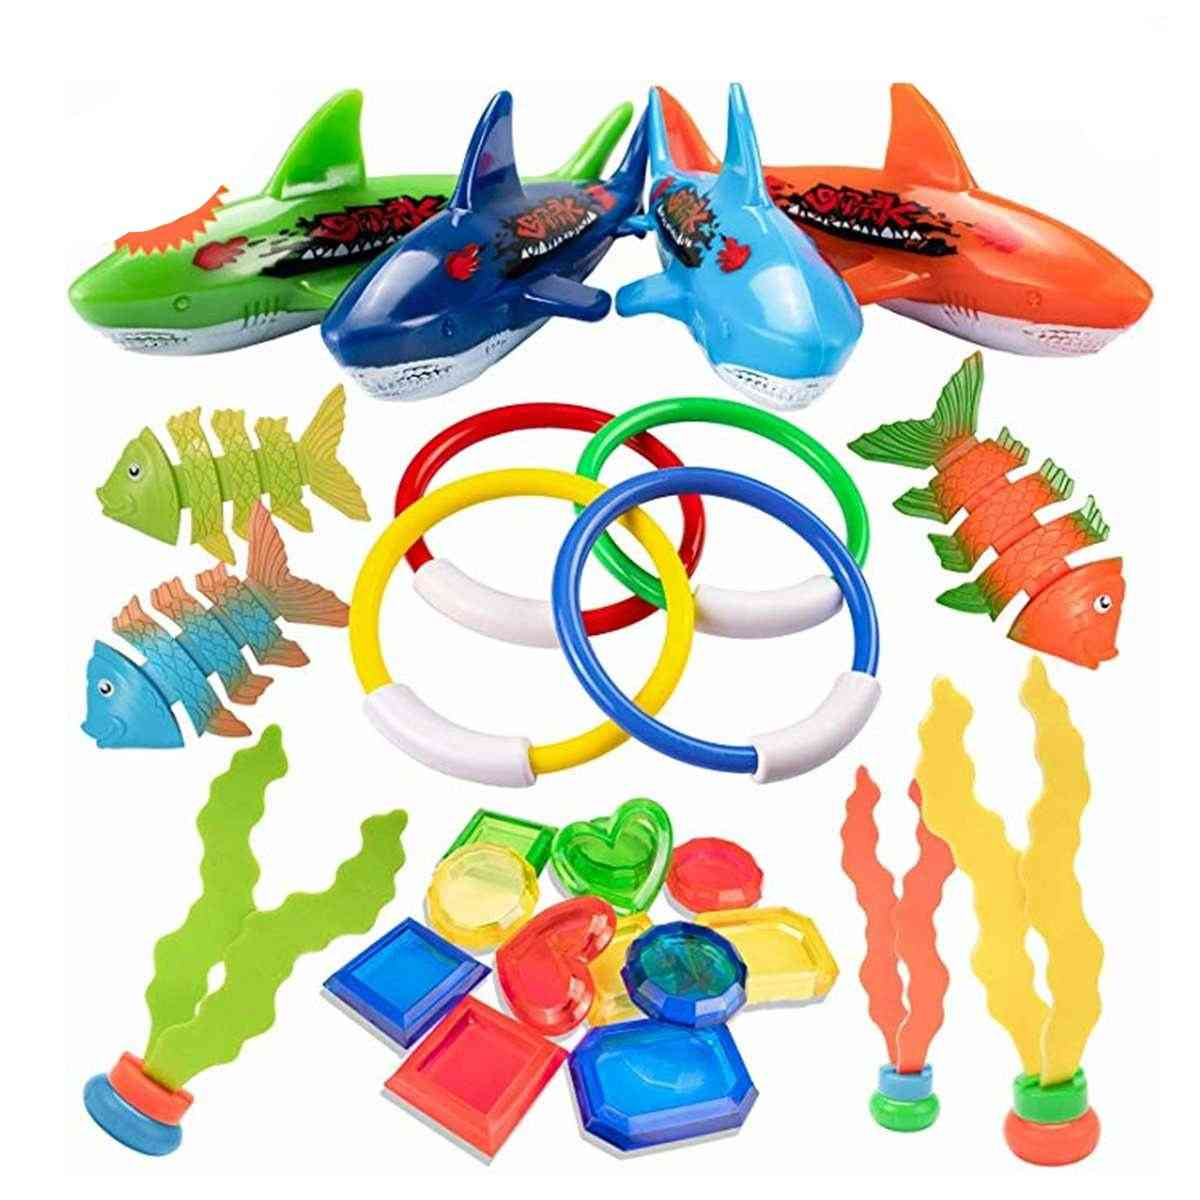 Summer Playing Swimming Pool Throwing Diving, Underwater Rings Circle Set Toy